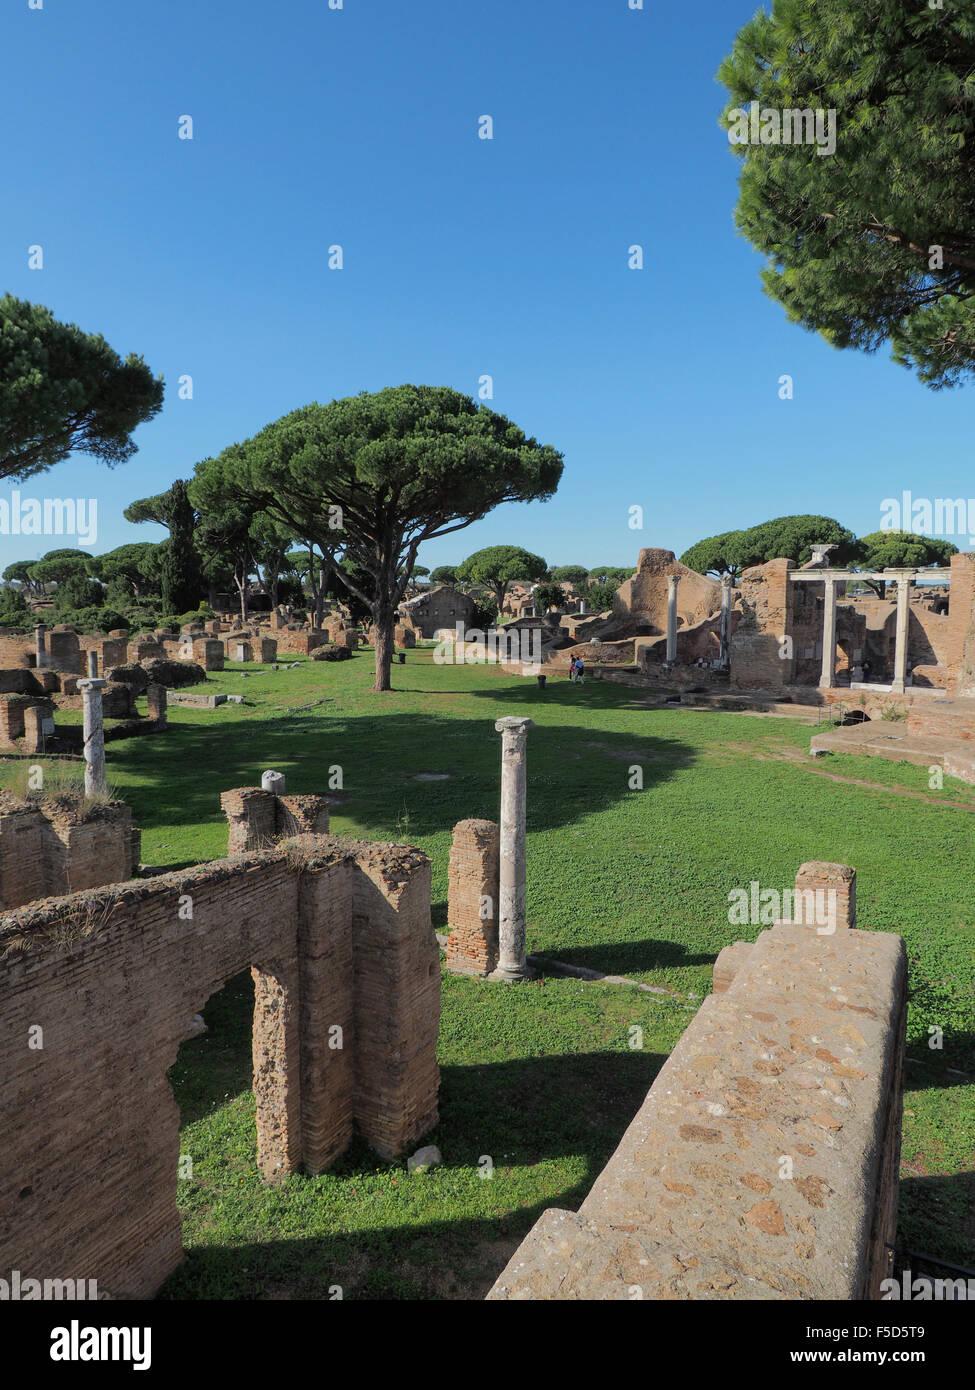 Ostia Antica excavation site, near Rome, Italy - Stock Image